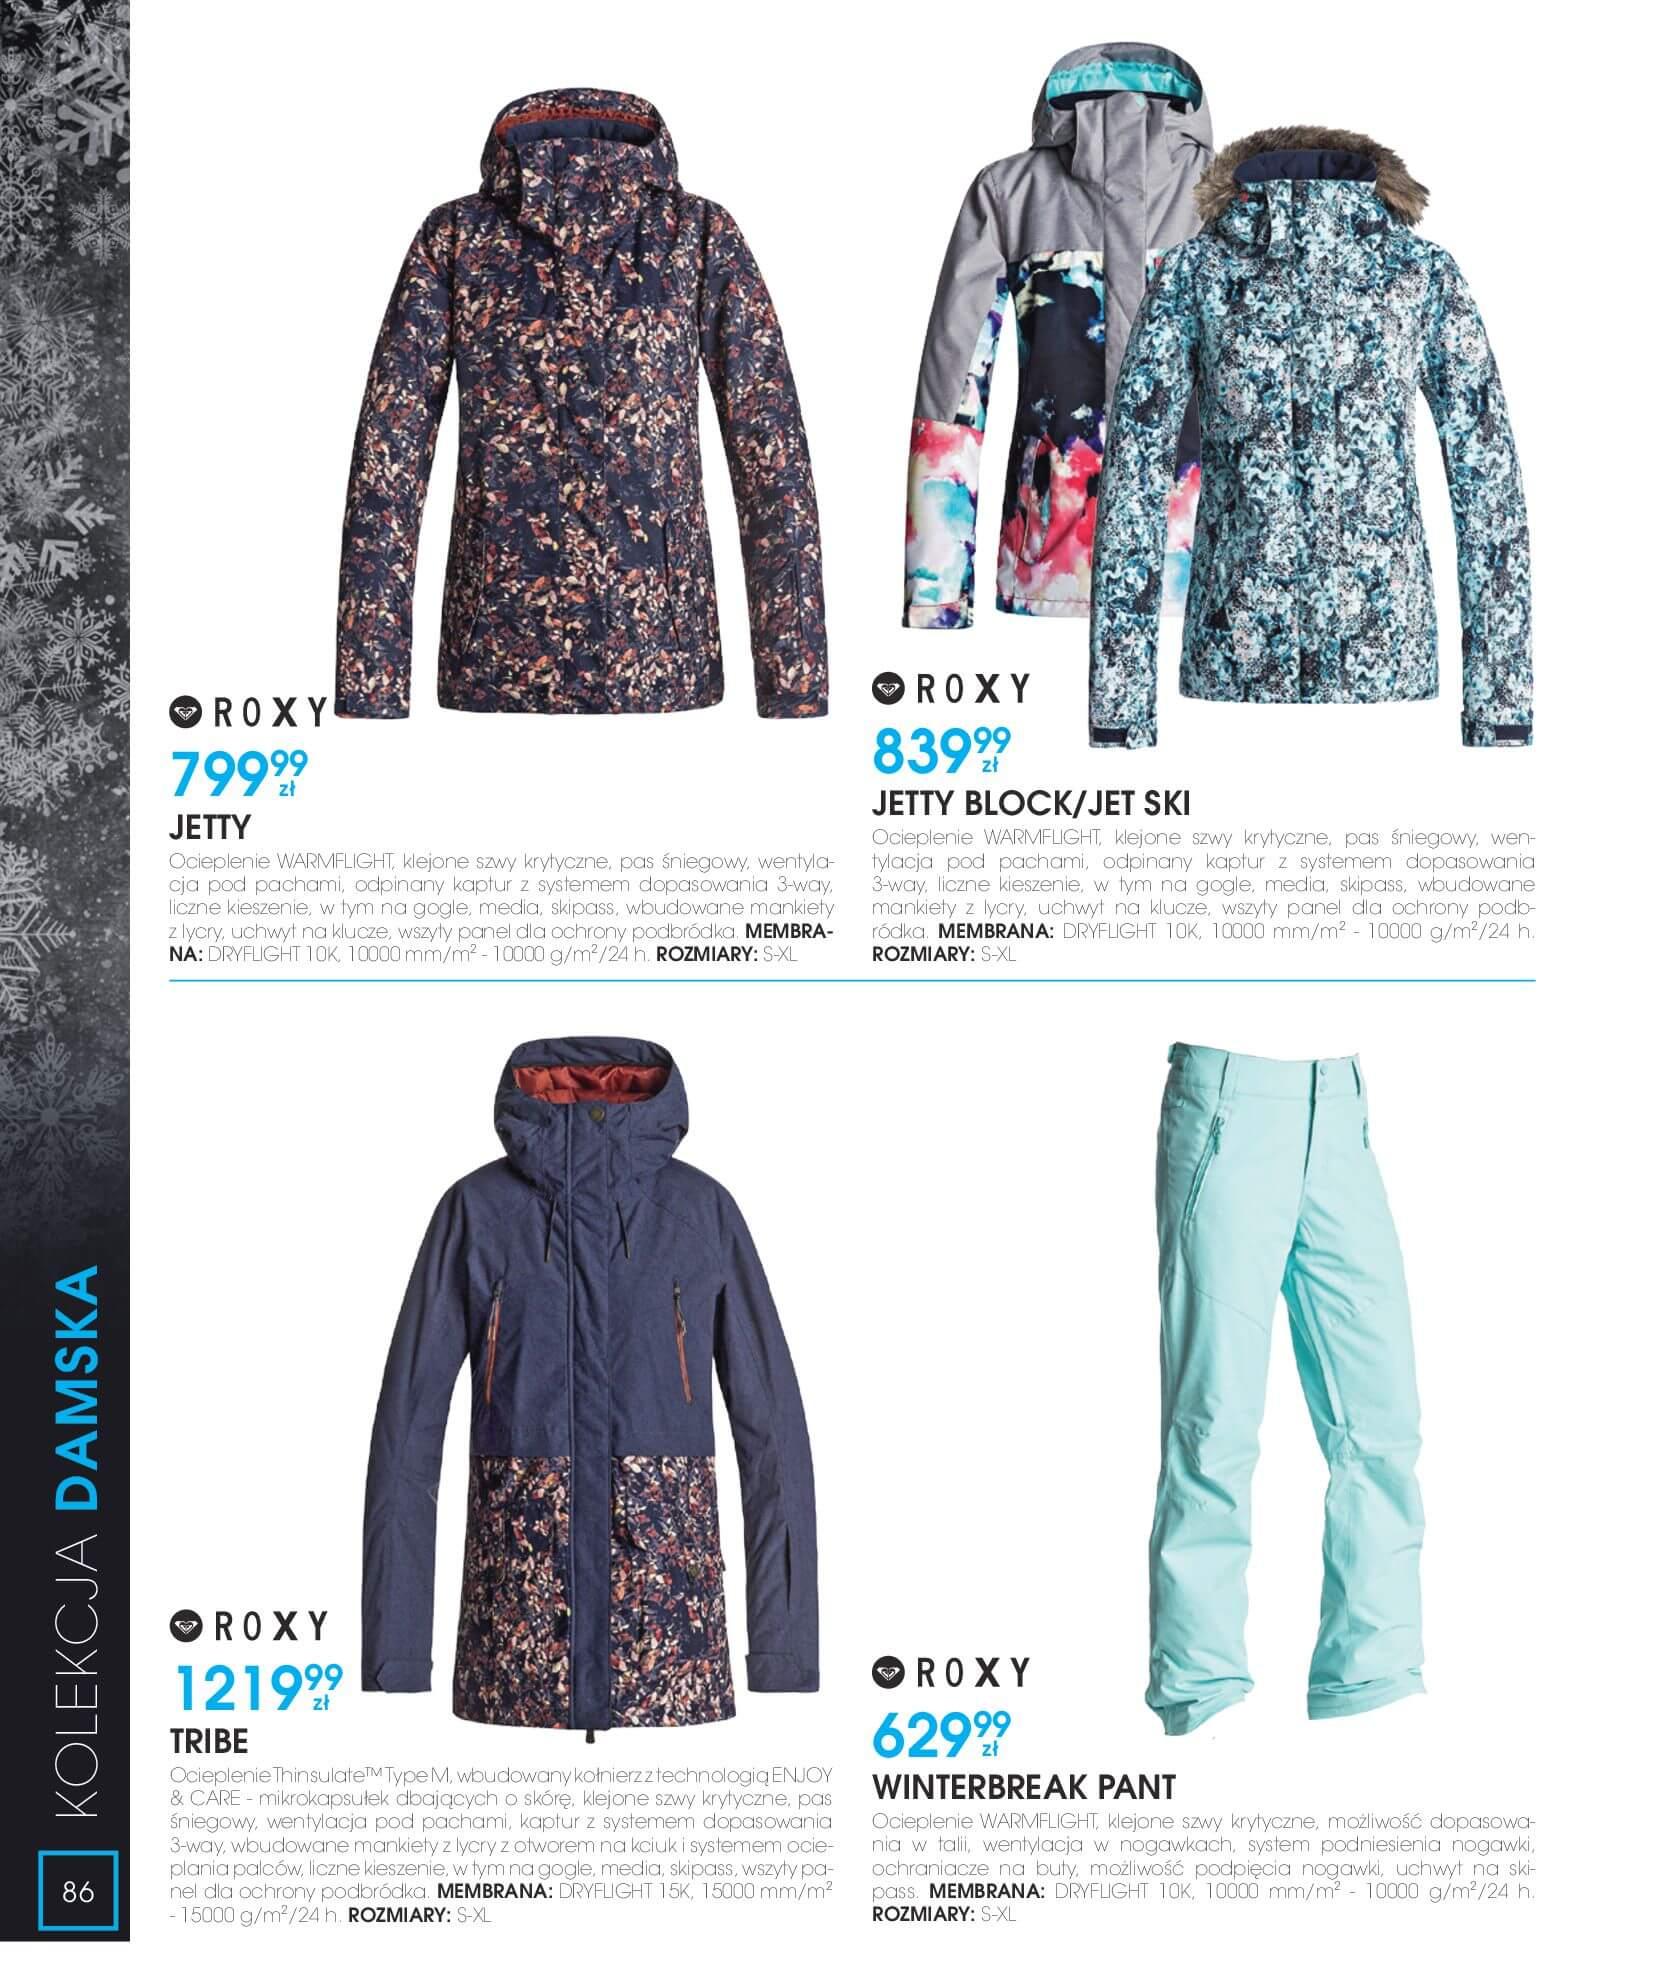 Gazetka Go Sport - Katalog Zima 2017/2018-12.11.2017-28.02.2018-page-86